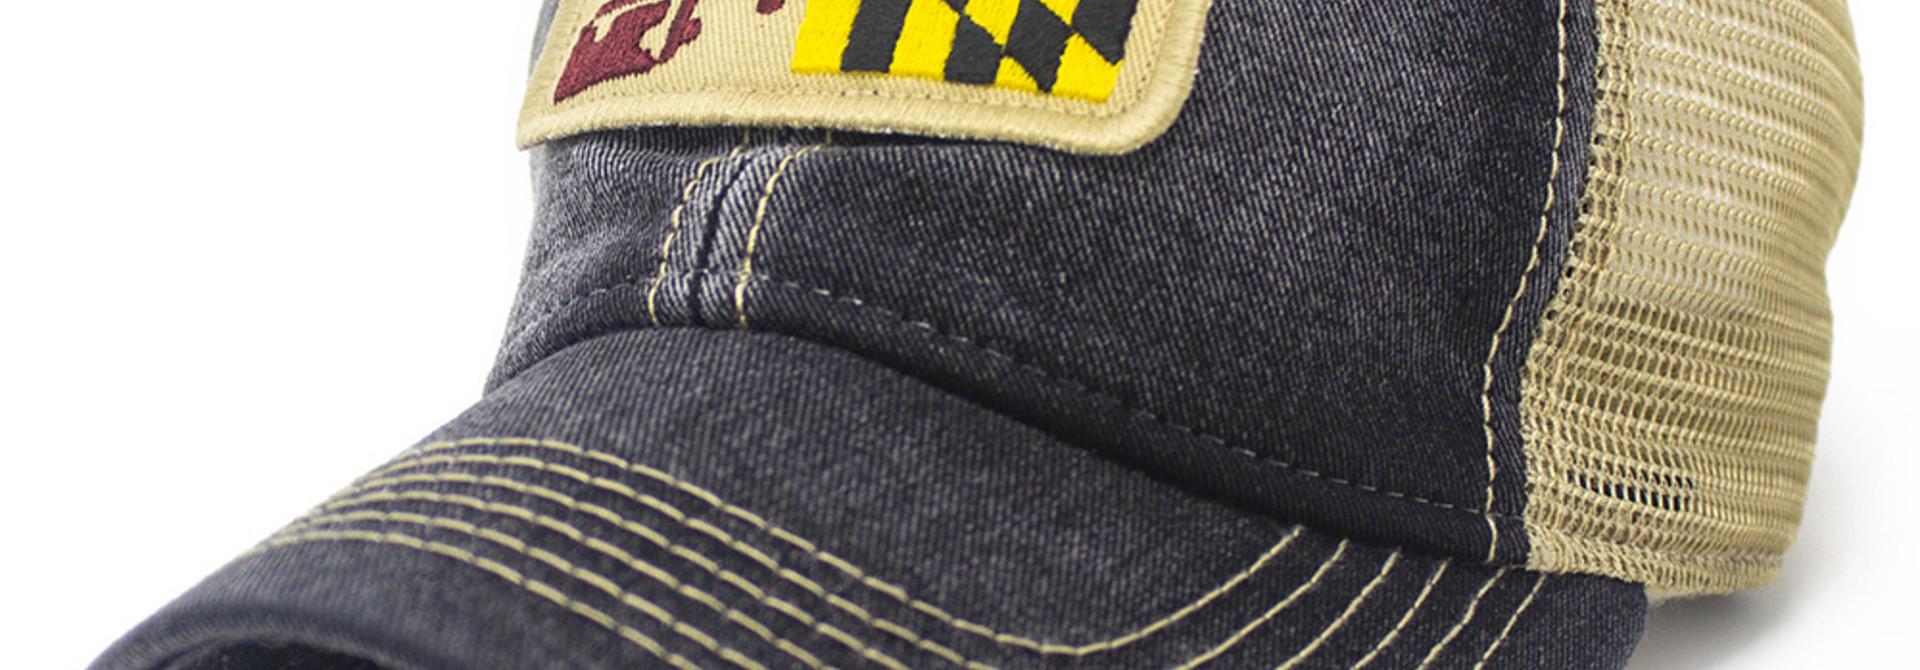 Maryland Flag Trucker Hat, Black